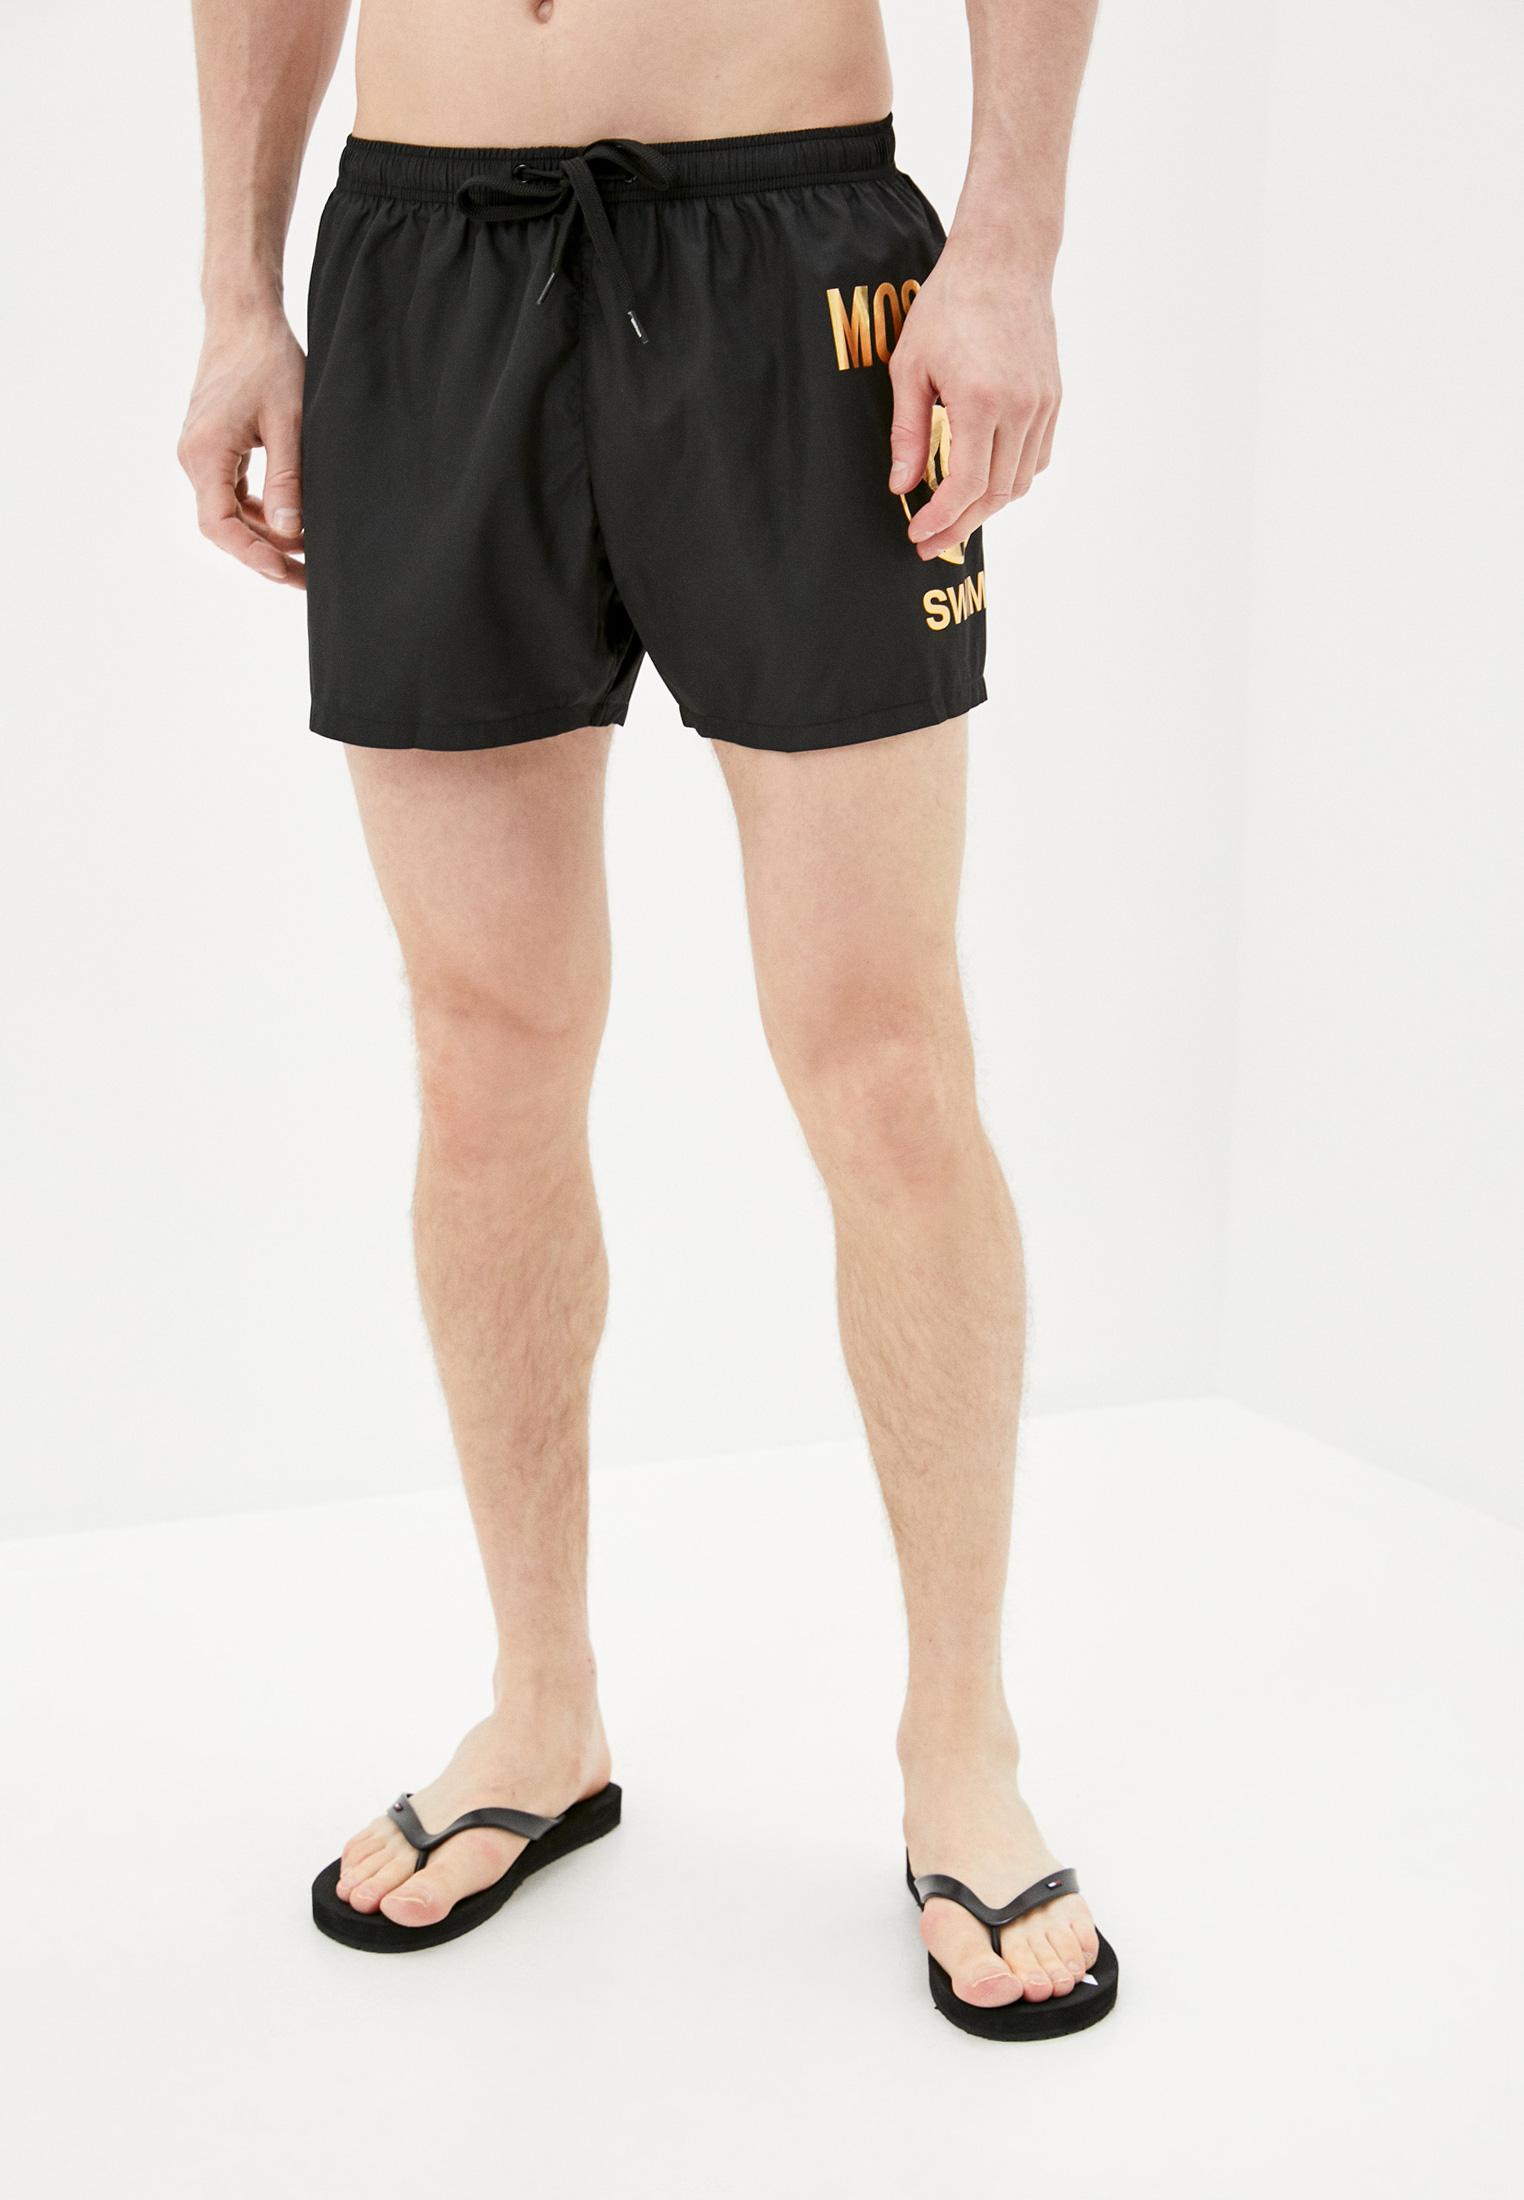 Мужские шорты для плавания Moschino swim A61385989